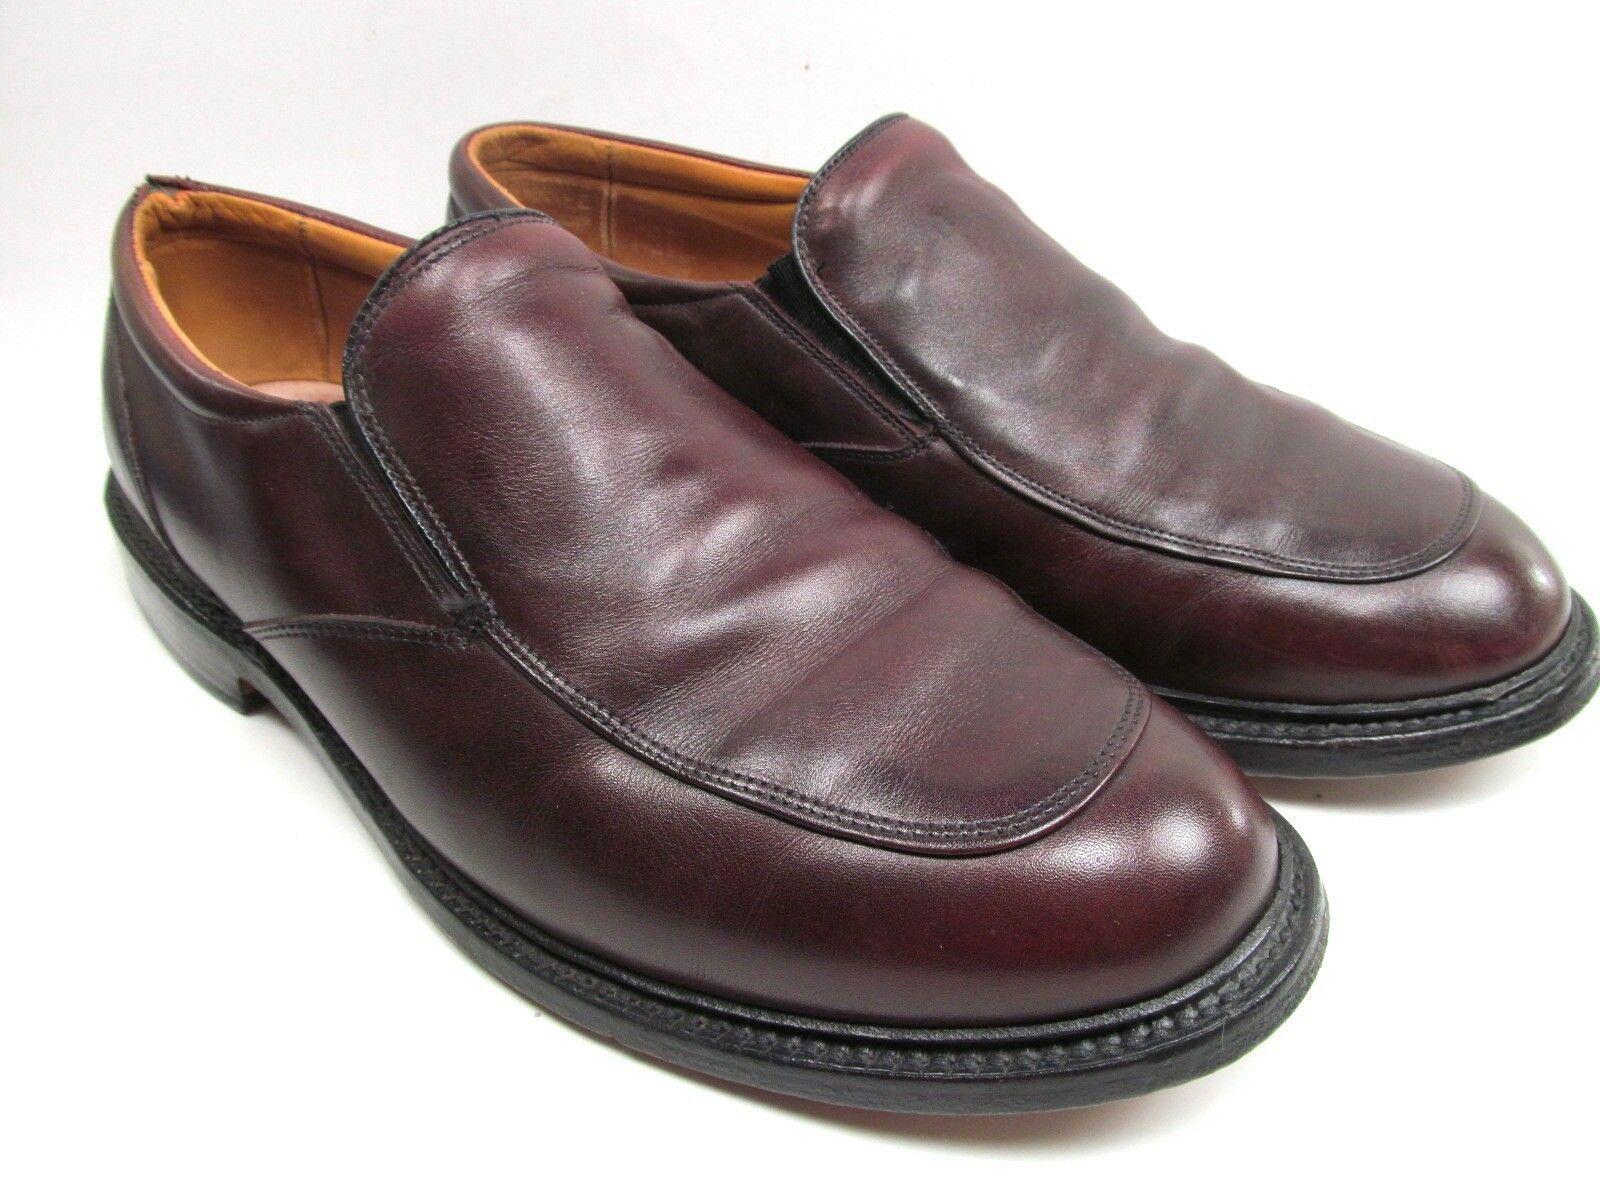 a2e712e6632 Allen Edmonds Mens Delcliffe Loafers Size 10 E Brown Leather Slip On Shoes  -  44.55